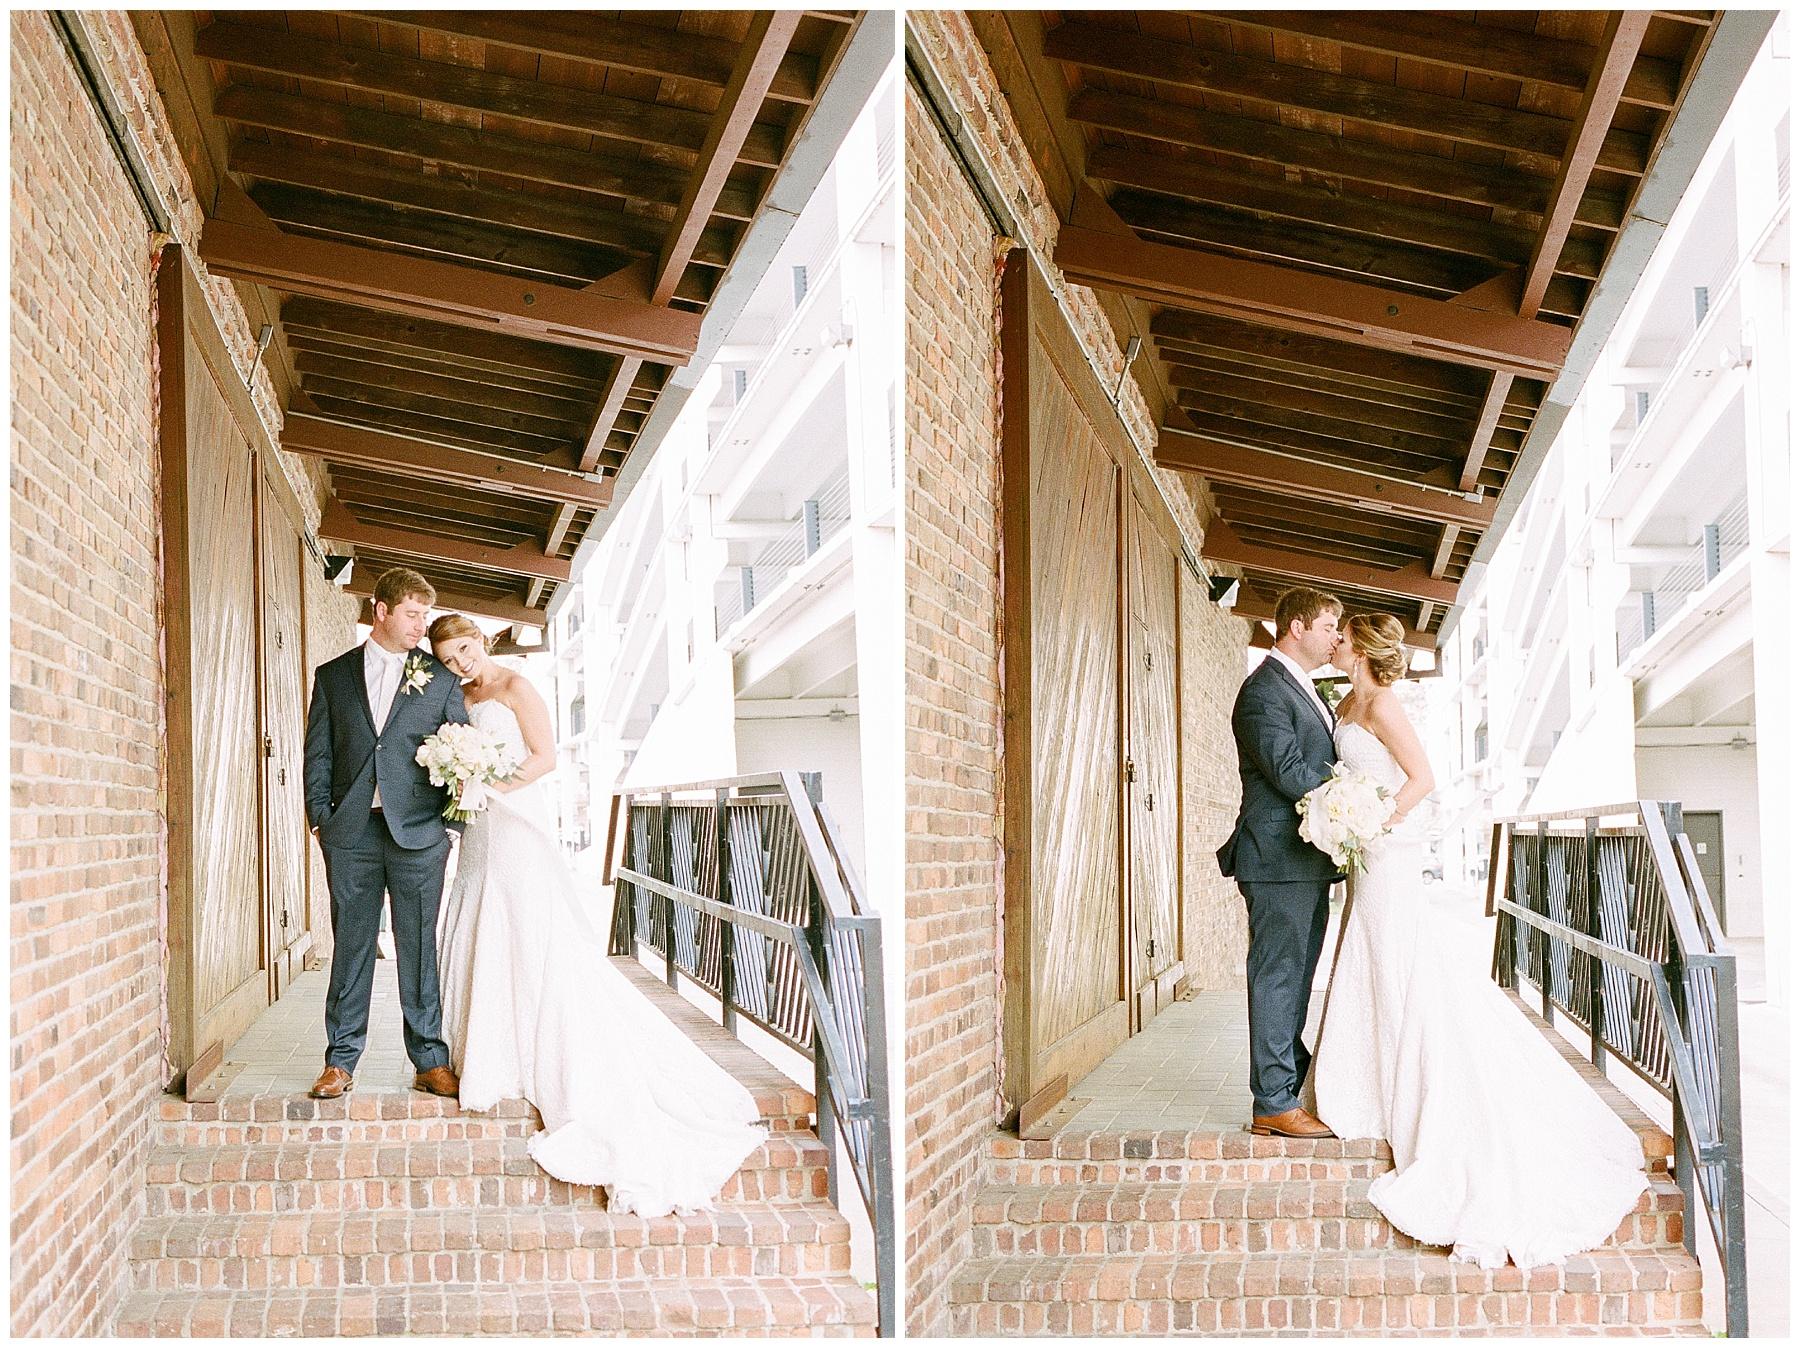 Wedding at The Blacksmith Shop in Macon, GA